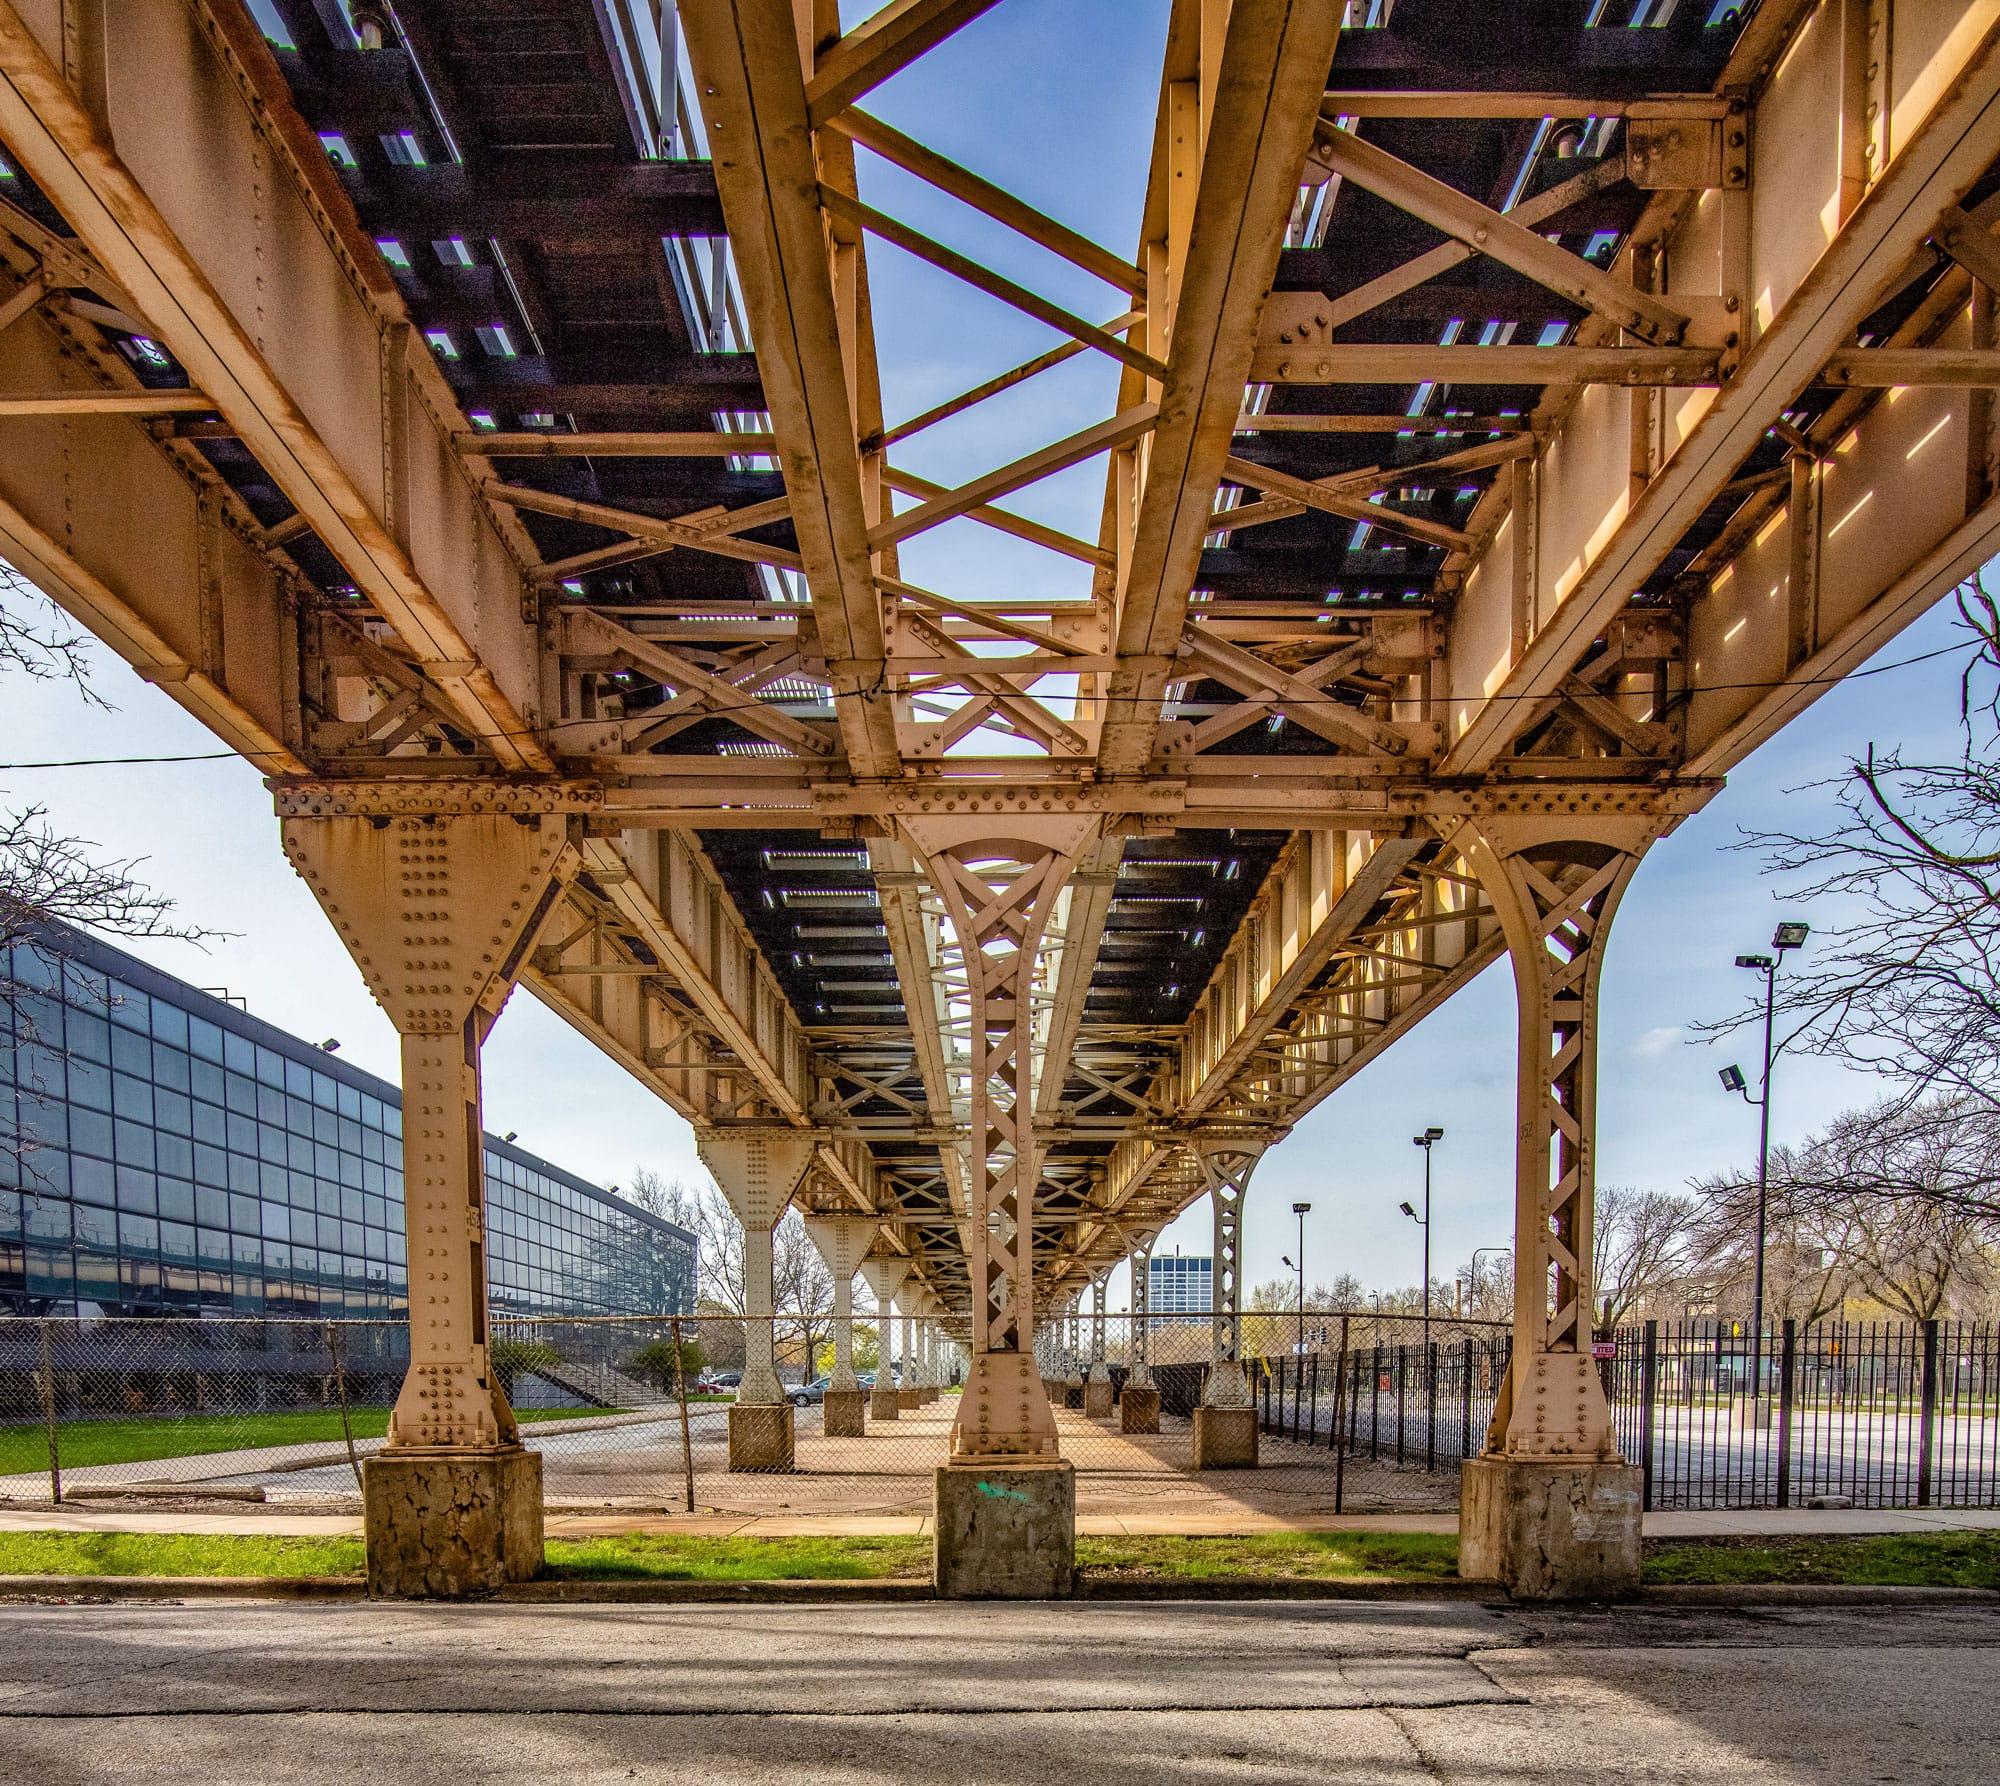 Chicago 'L' tracks